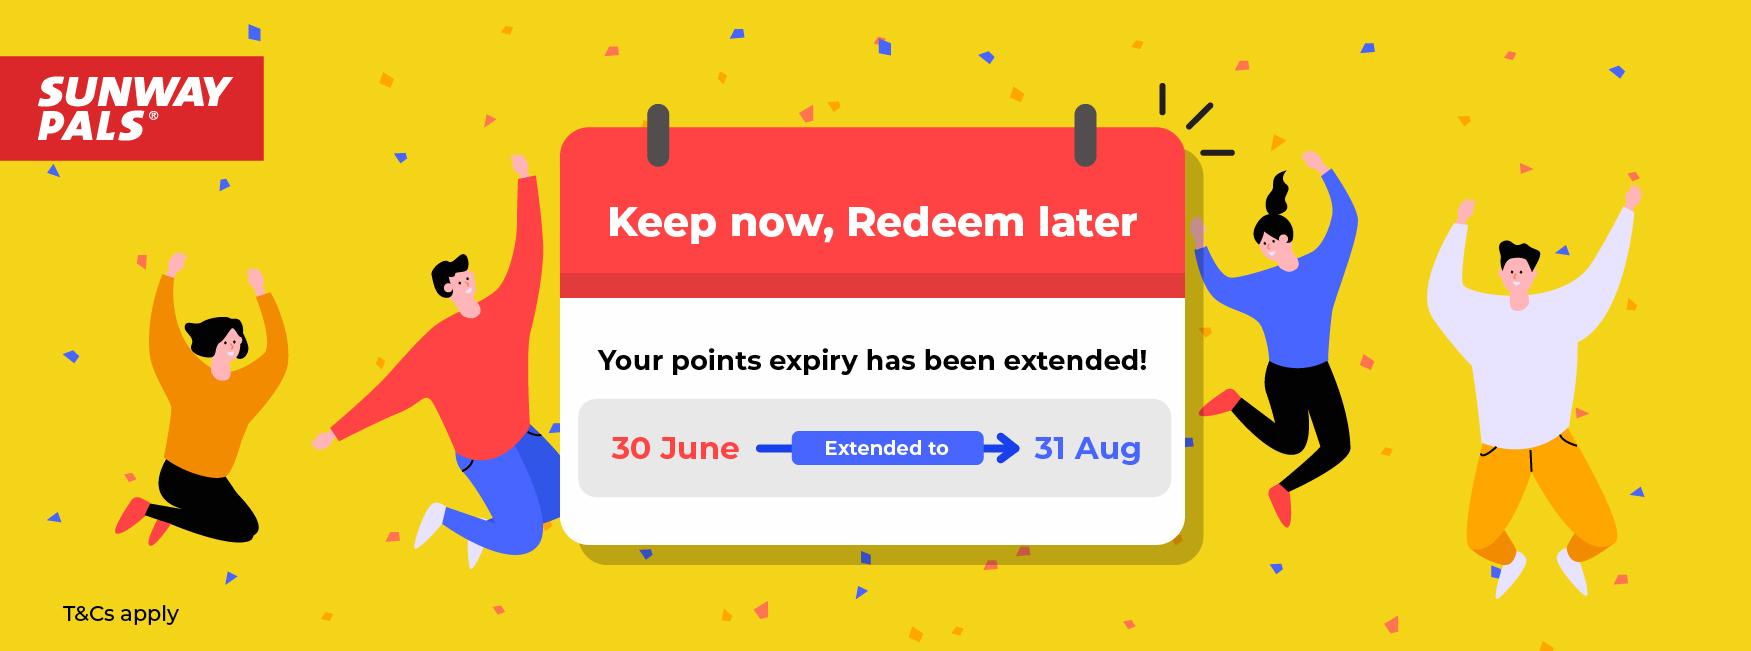 Points Expiry Extension